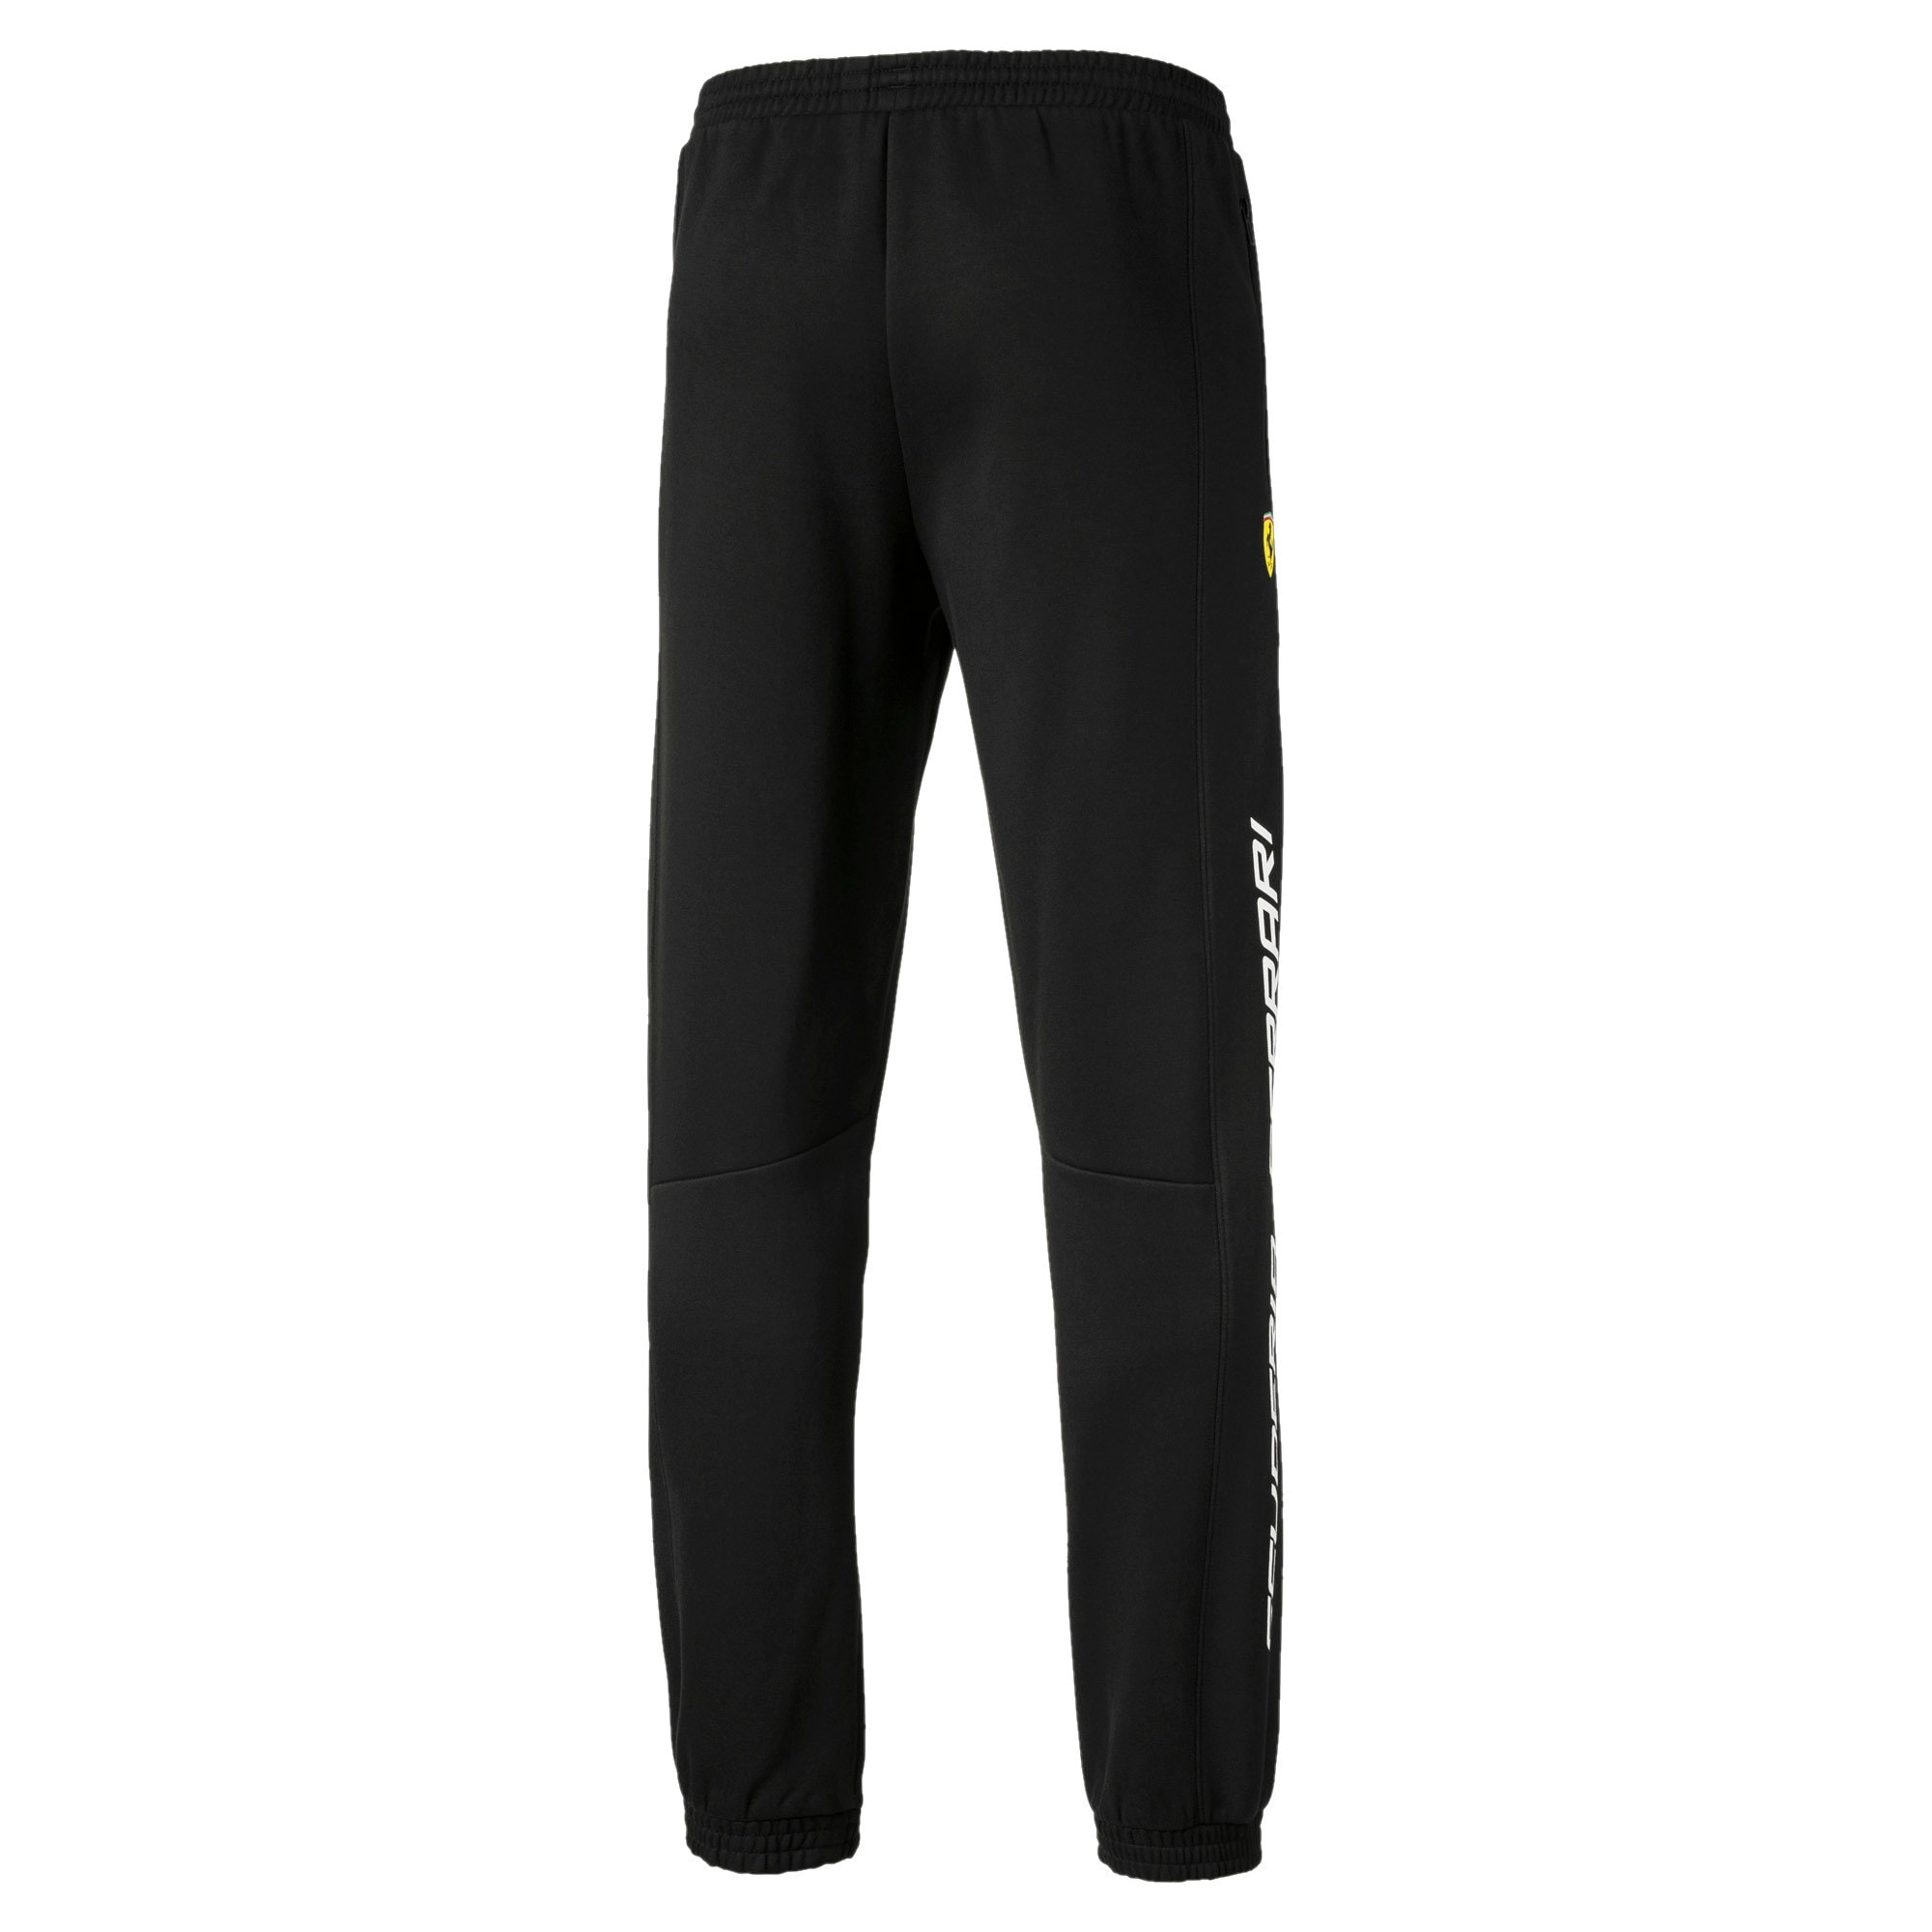 Miniatura 2 de Pantalones deportivos Scuderia Ferrari para hombre, Puma Black, mediano